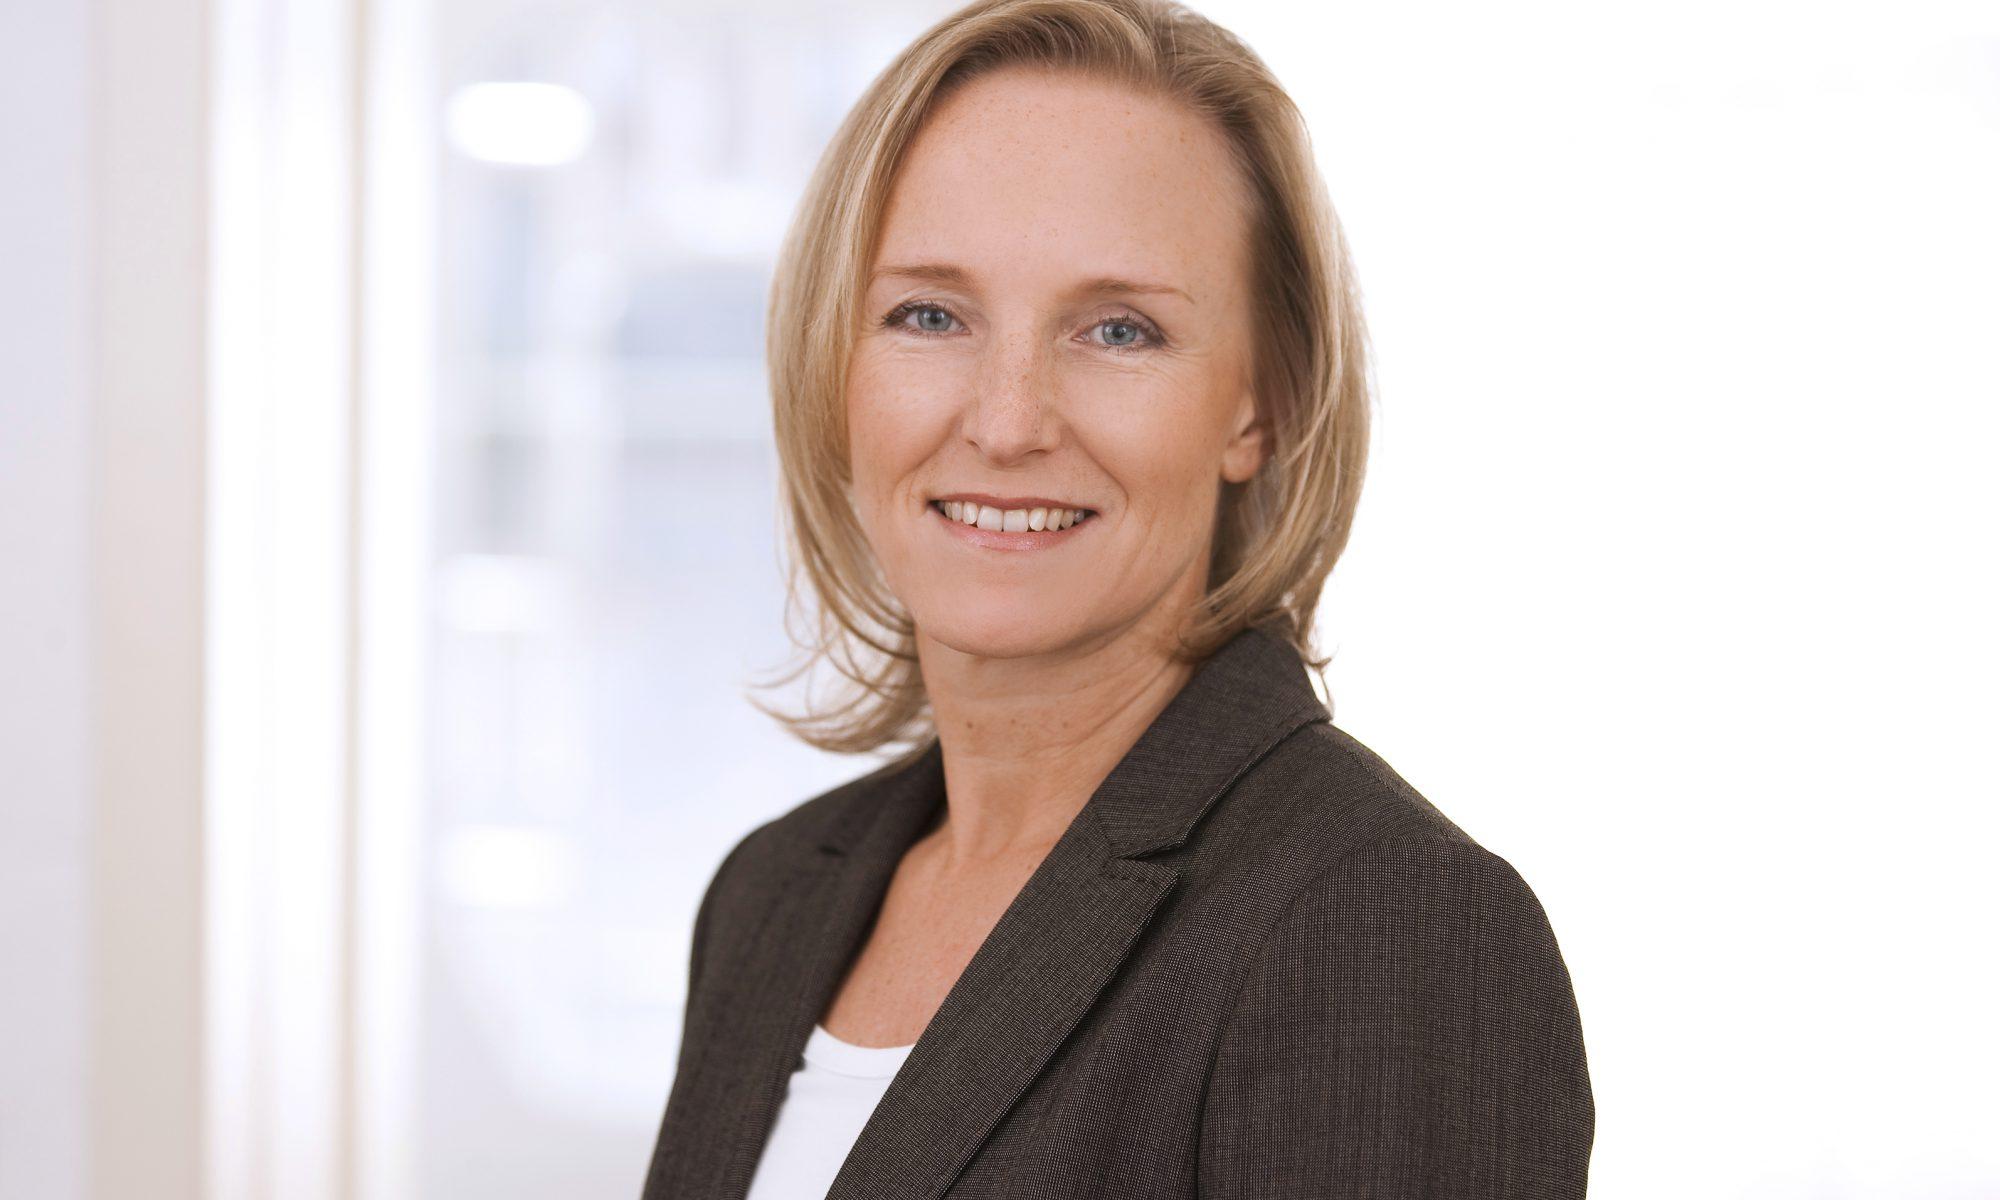 Sevira Patricia Landsberg, sevira Consult